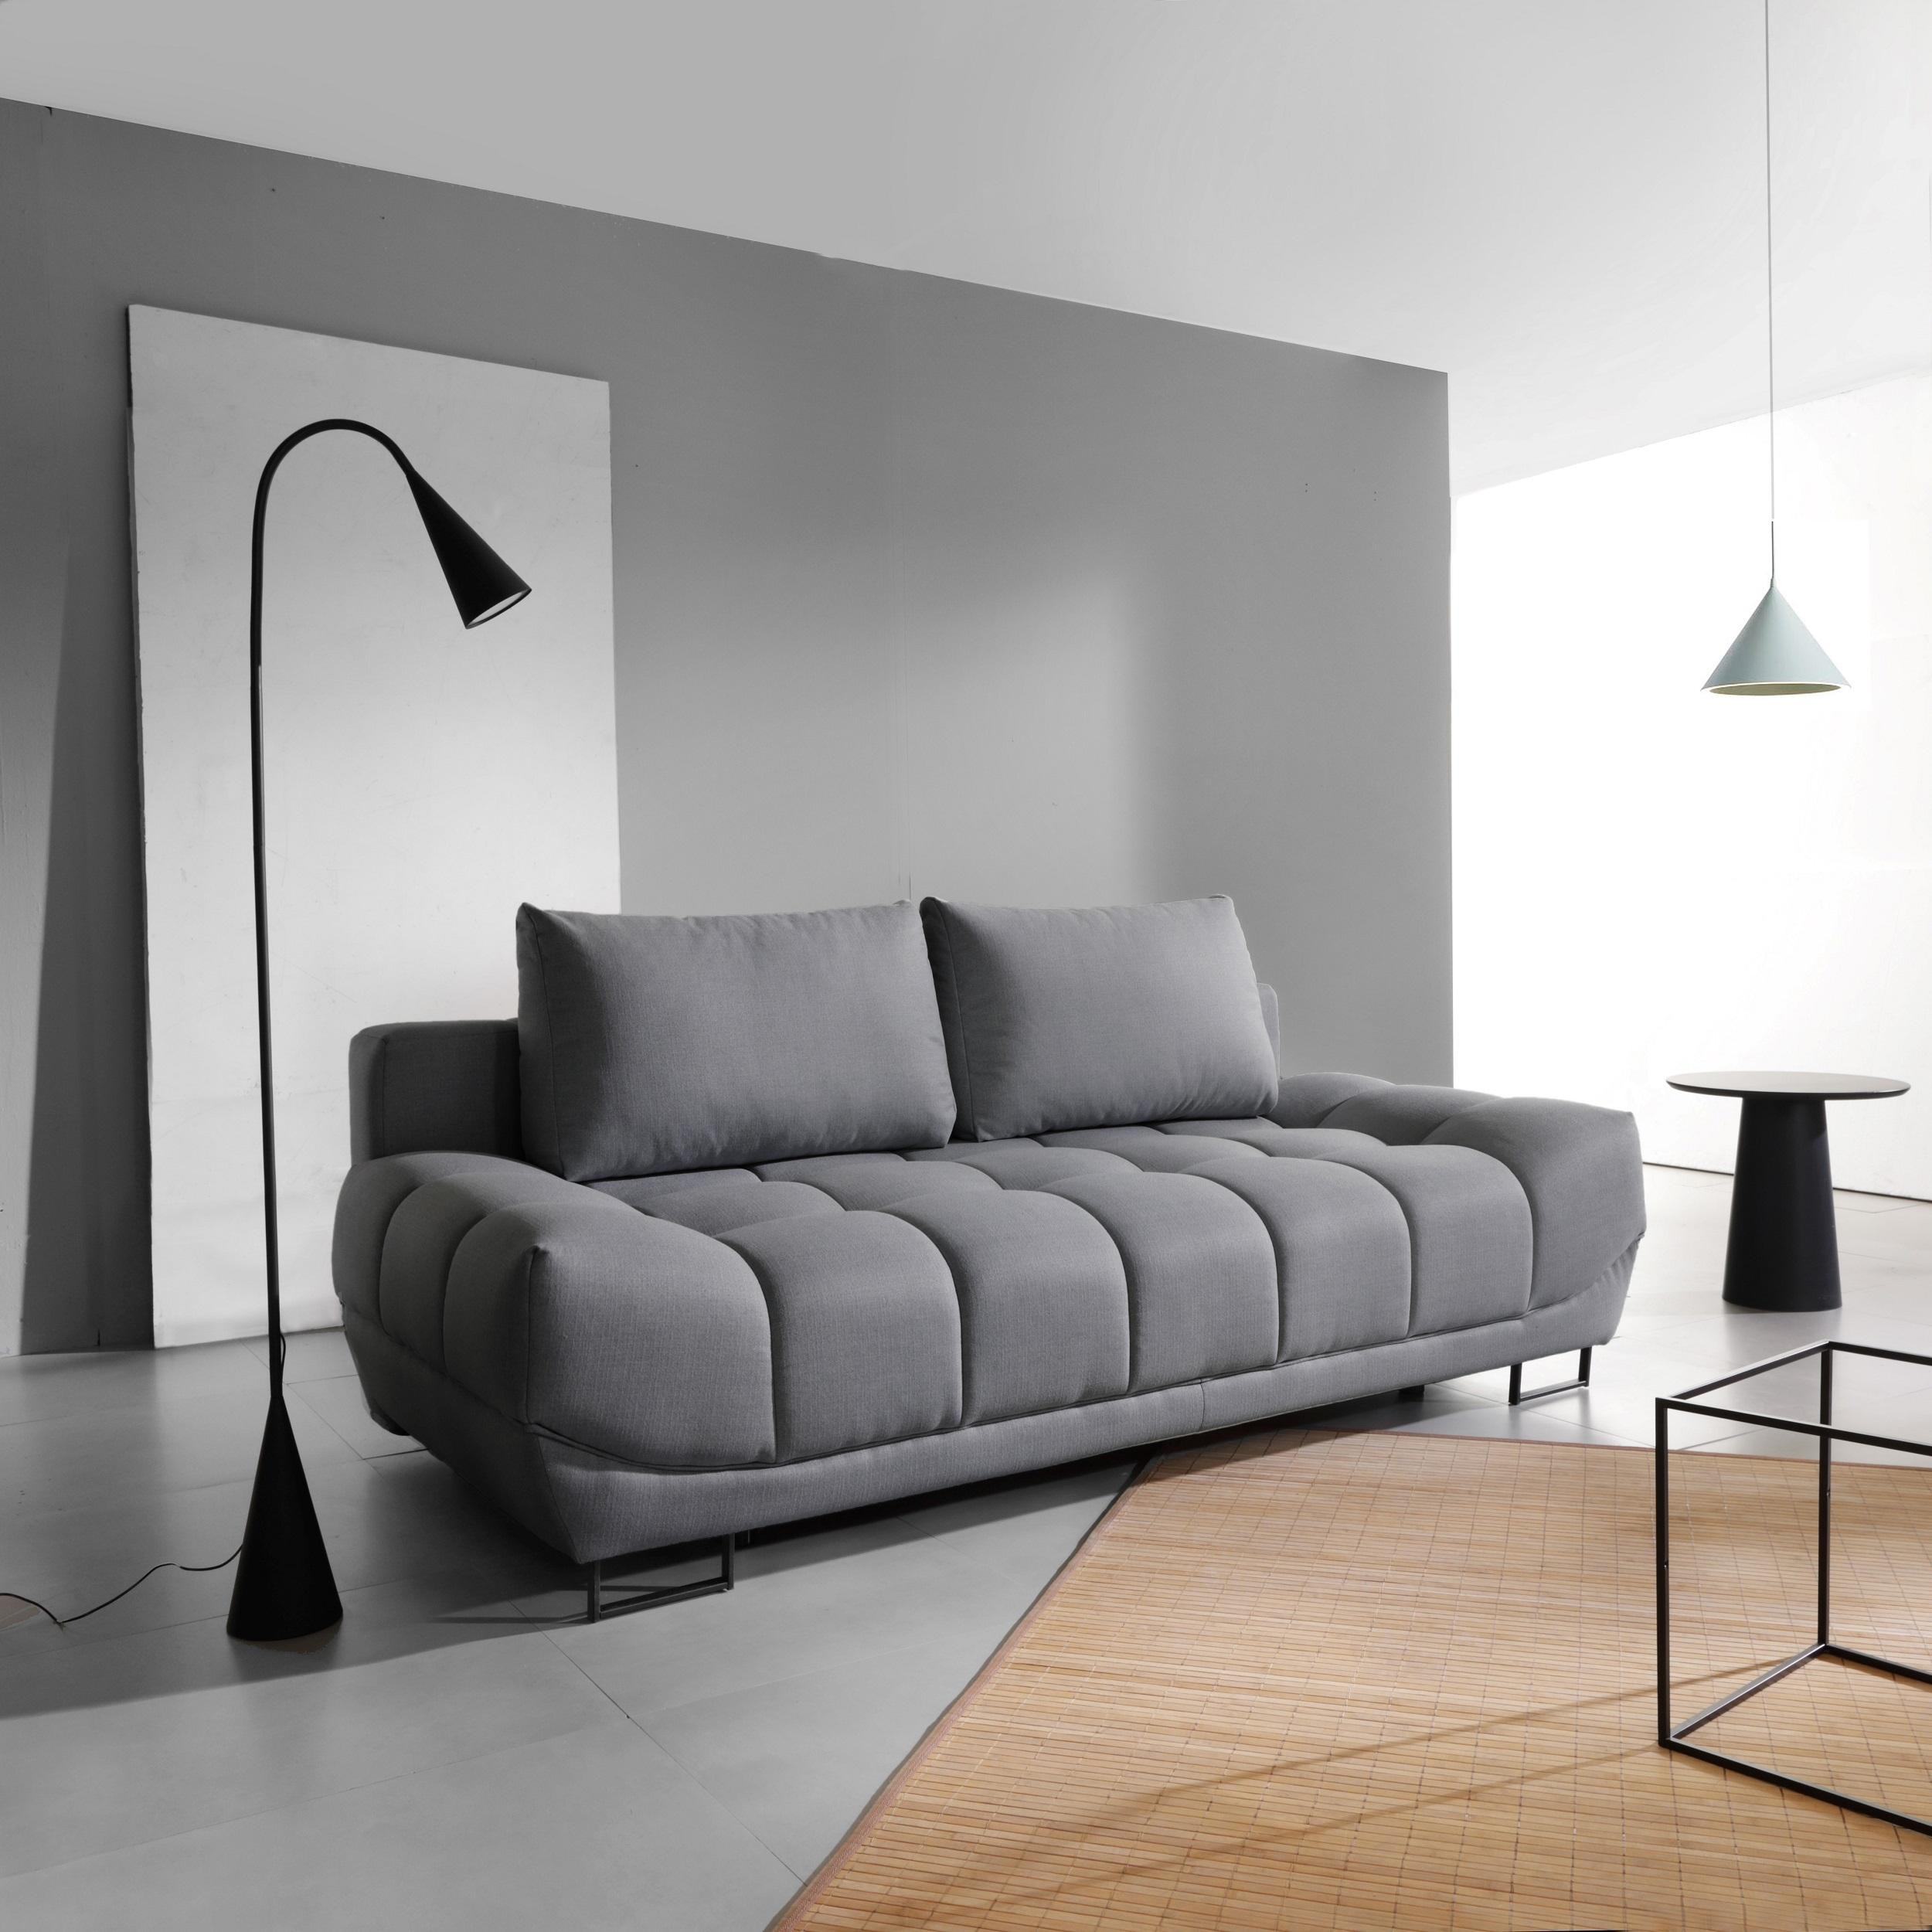 Canapea extensibila cu lada de depozitare, 3 locuri Venice Grey, l218xA112xH71 cm